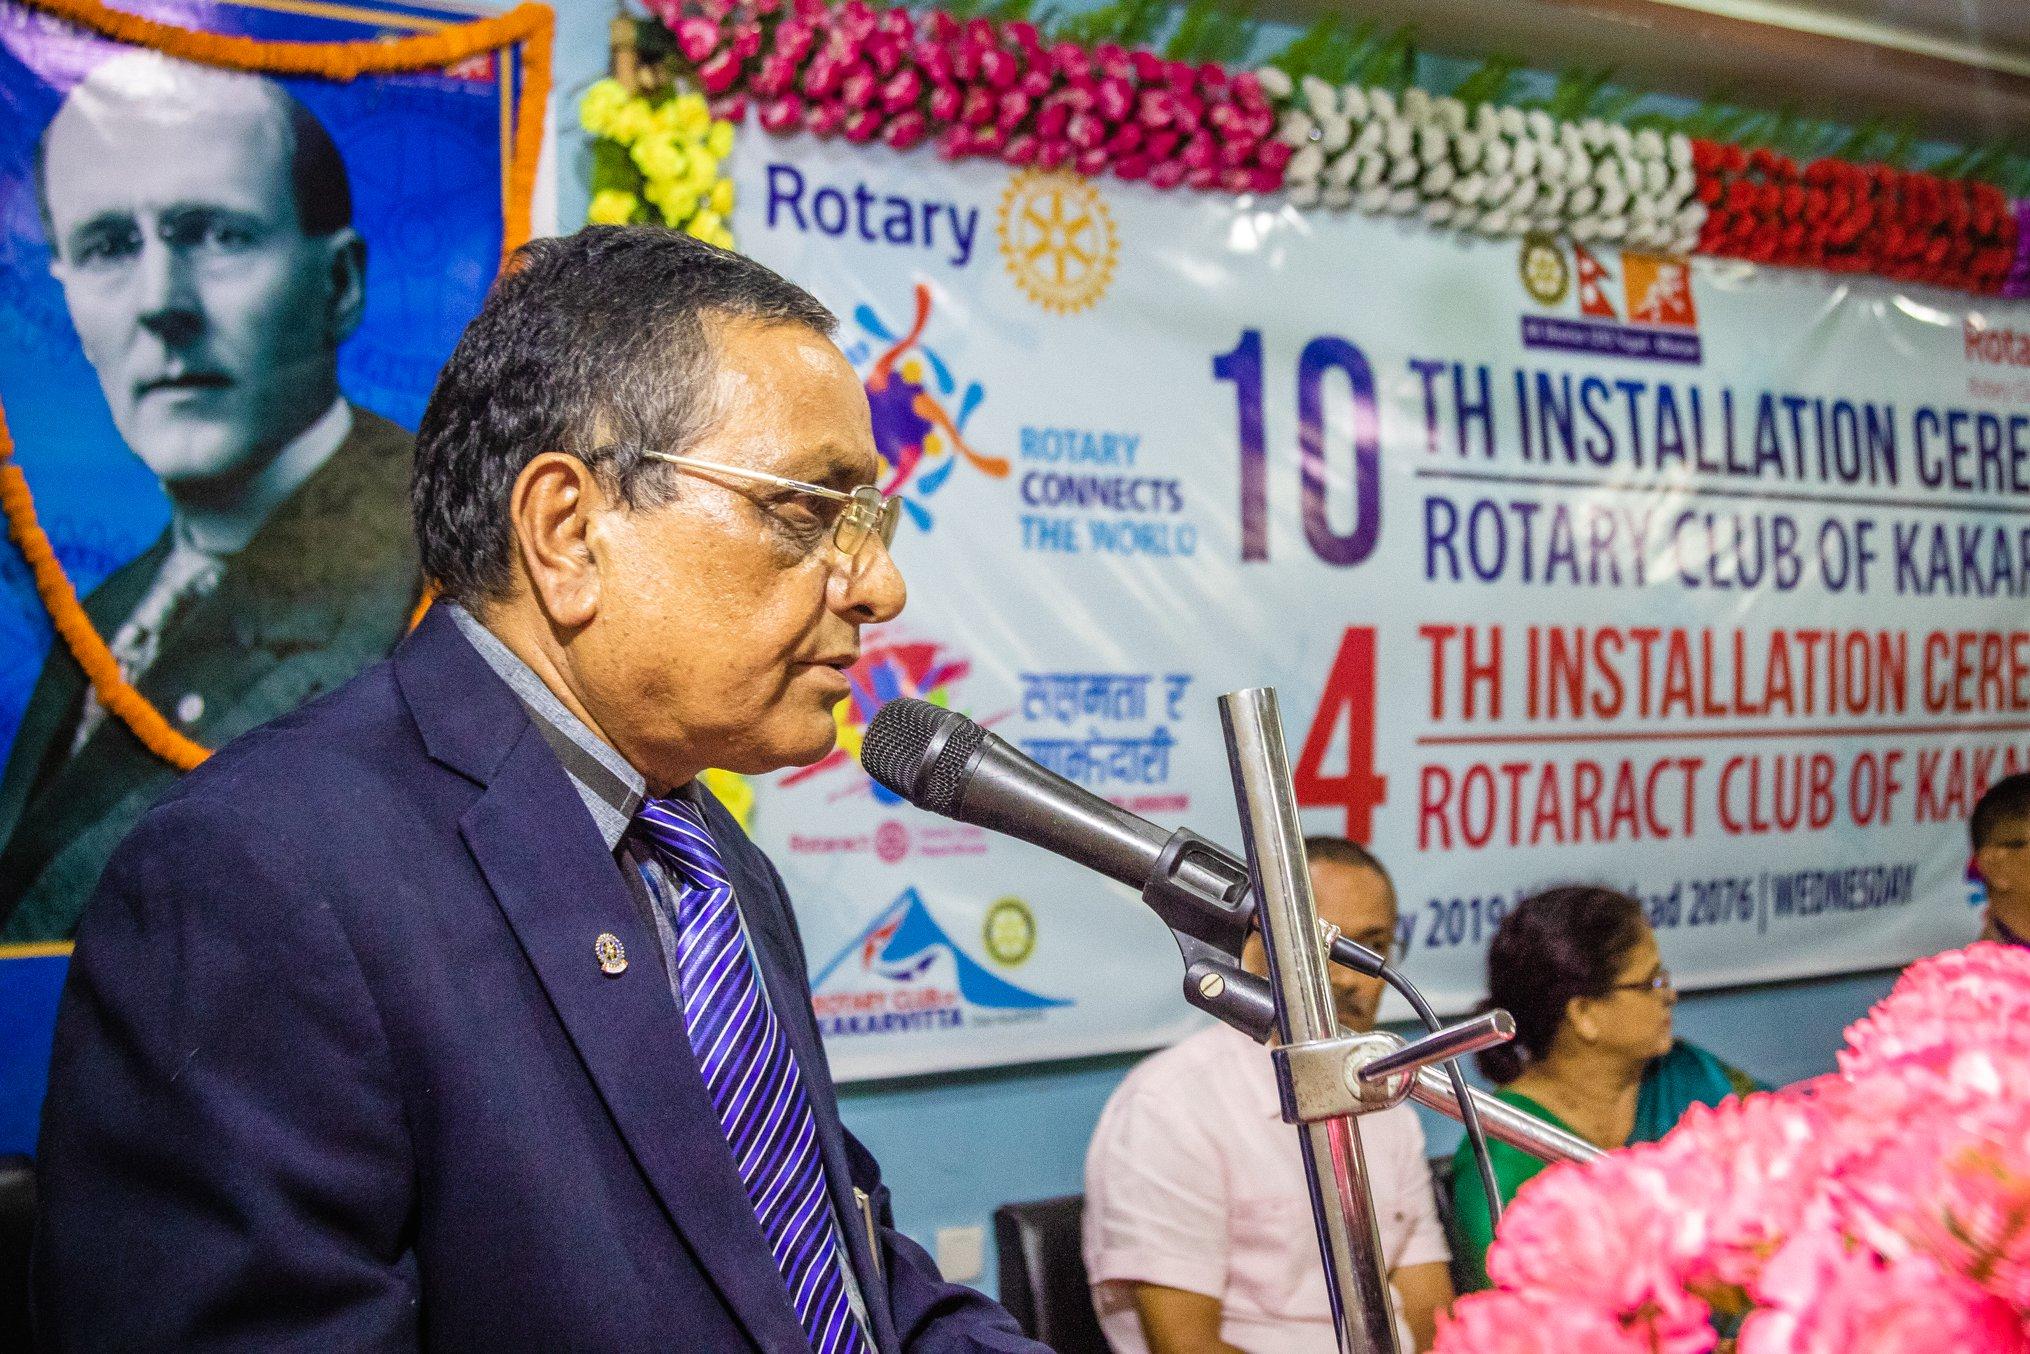 10th Installation Ceremony Rotary Club Of Kakarvitta 36